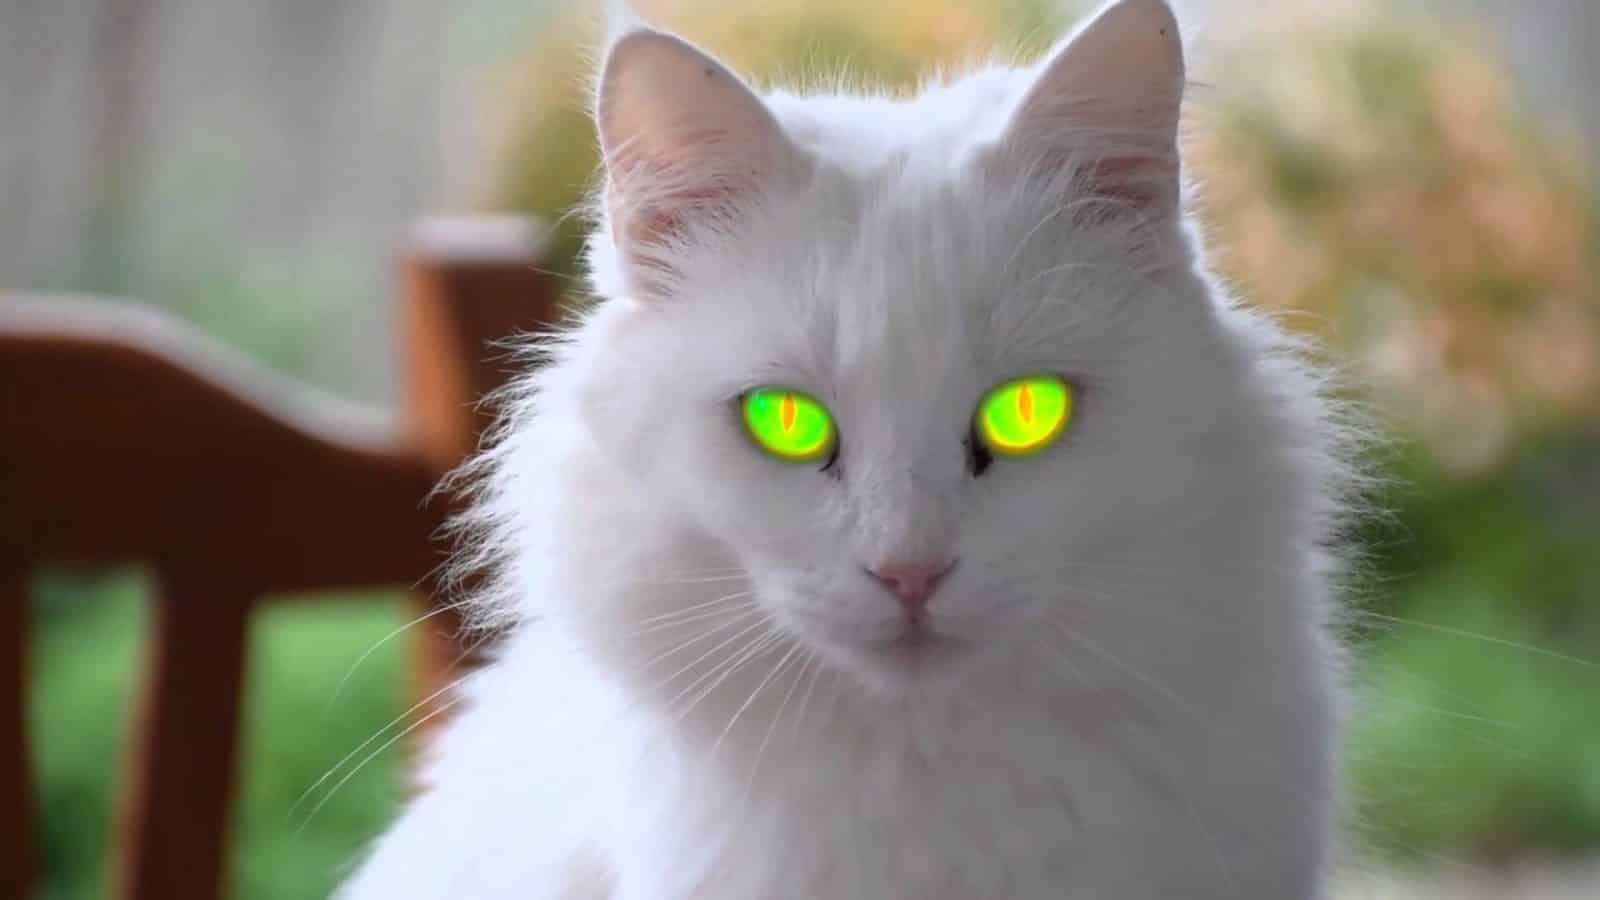 صورة اجمل صور قطط , صور قطط كيوت جدا